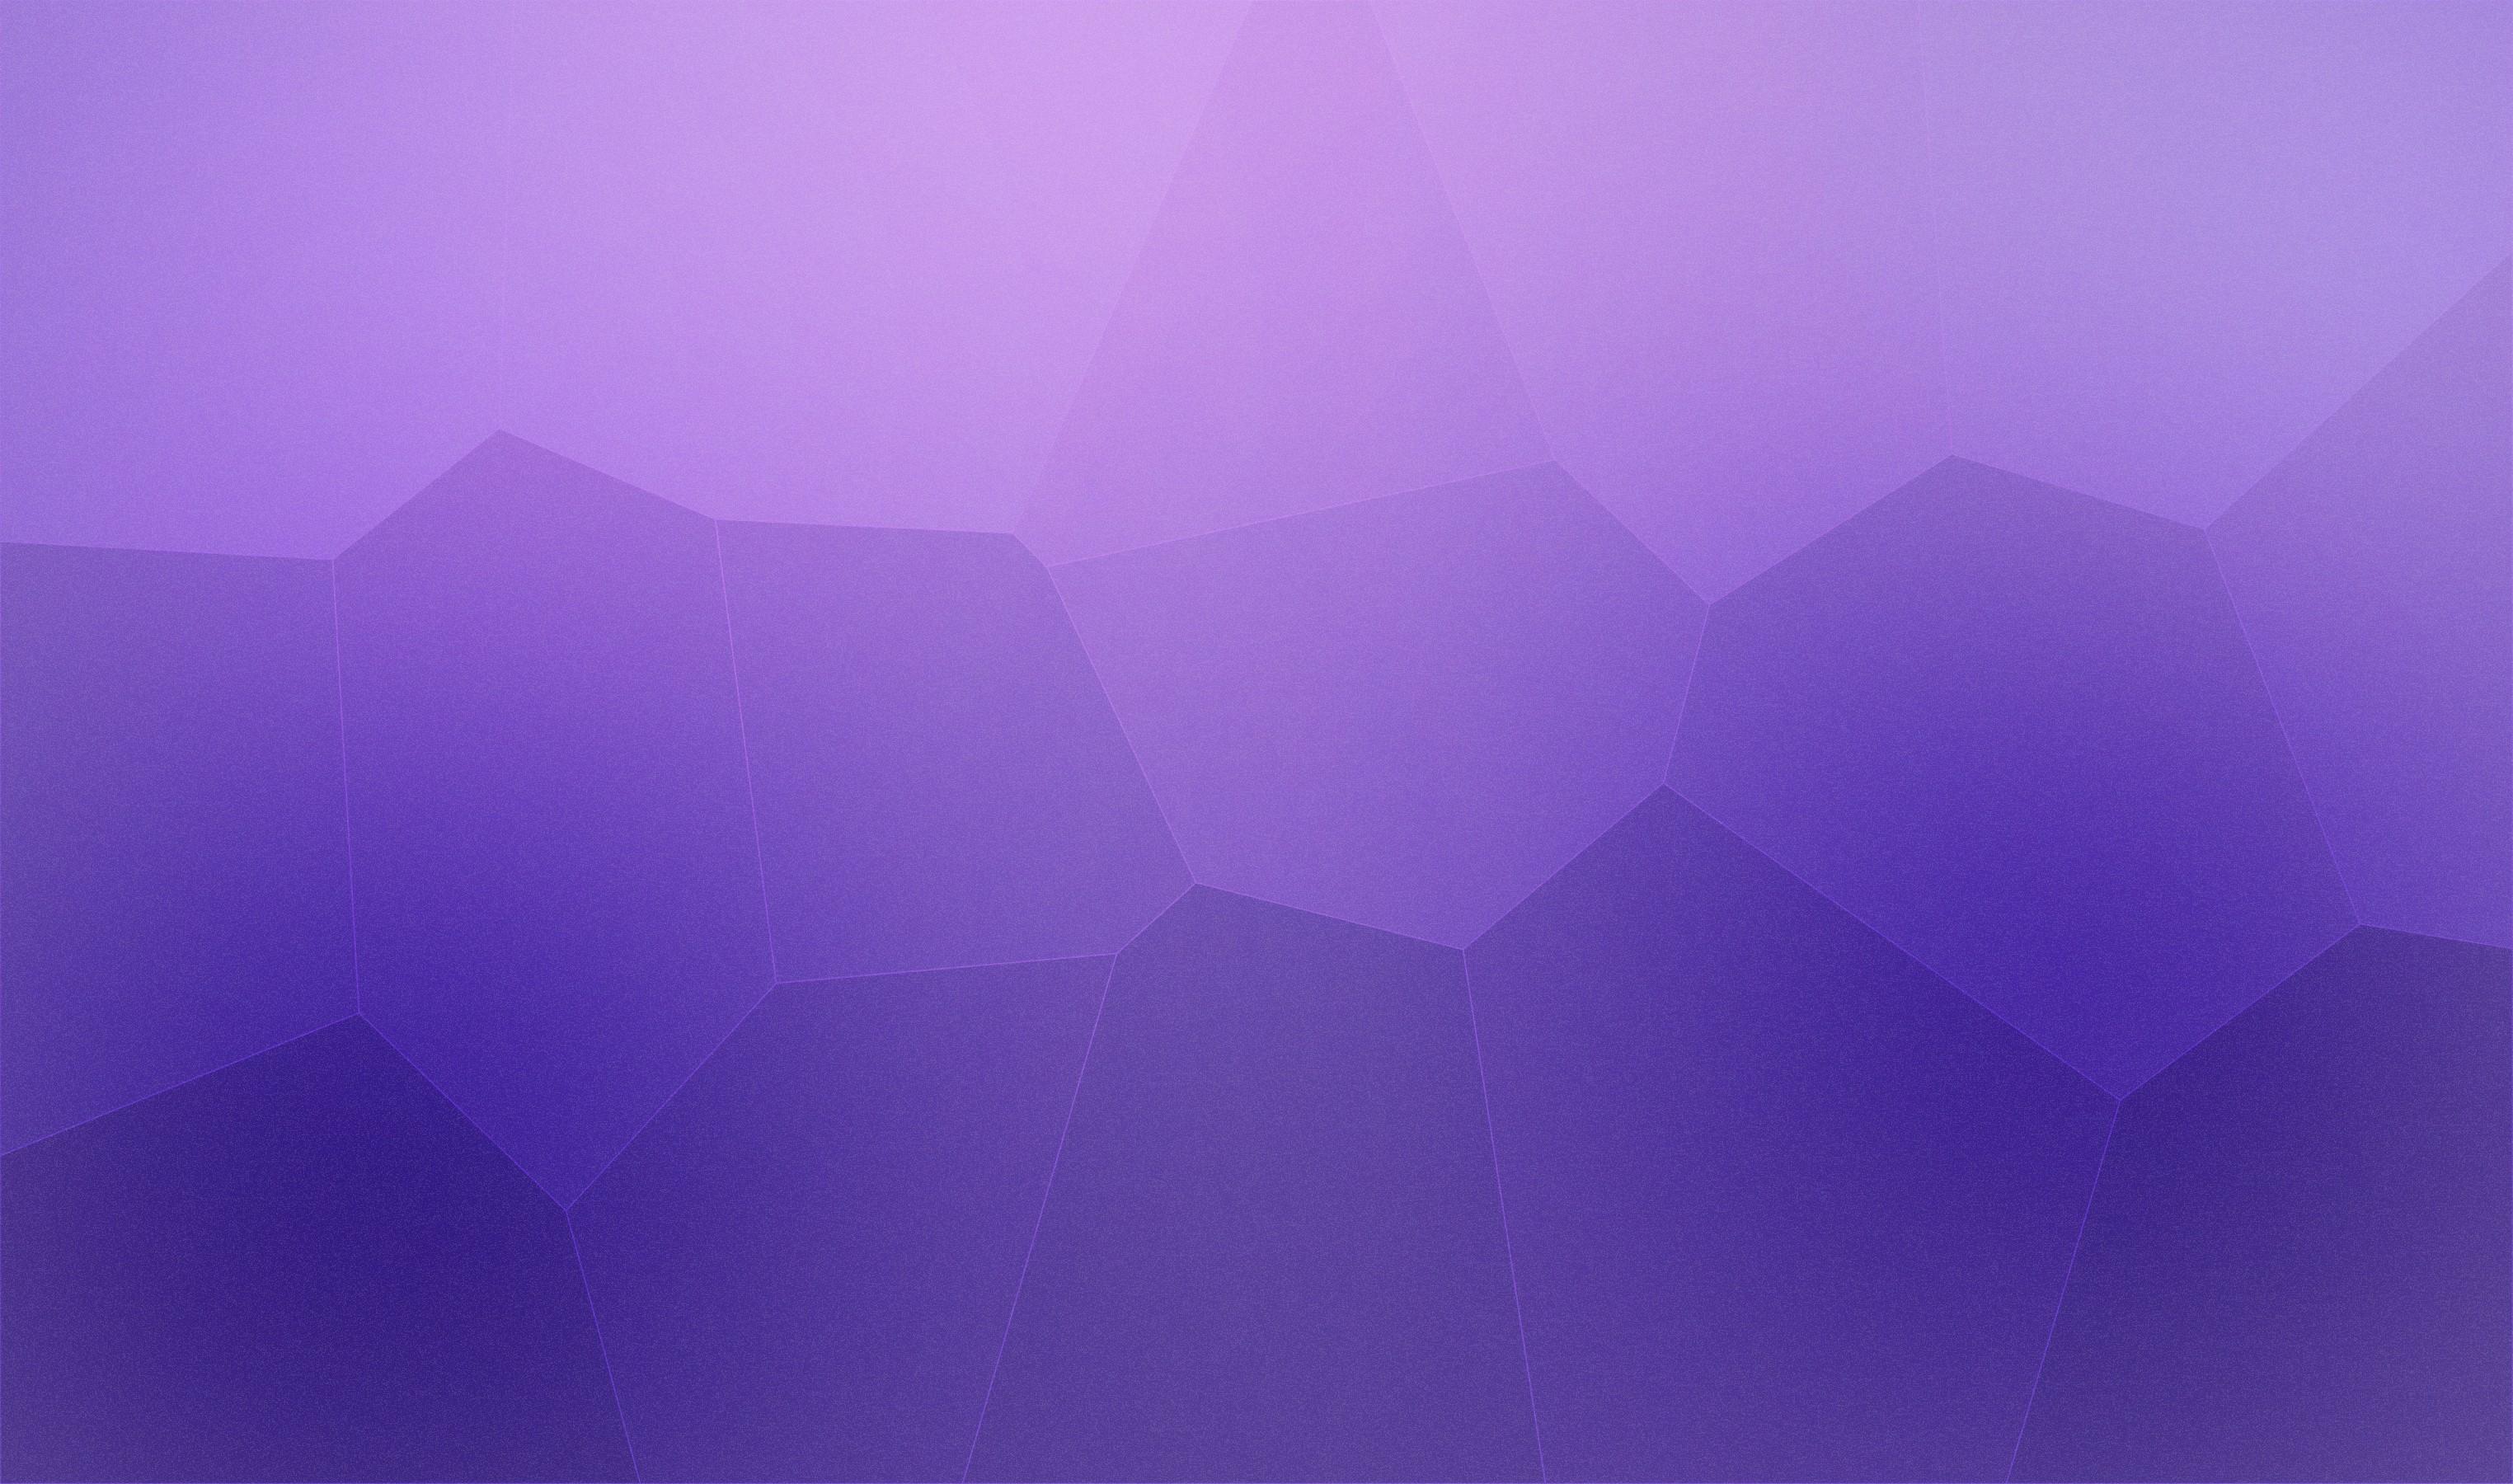 Lavender Color Wallpaper Hd วอลเปเปอร์ ความเรียบง่าย พื้นหลังสีม่วง สมมาตร สีน้ำ